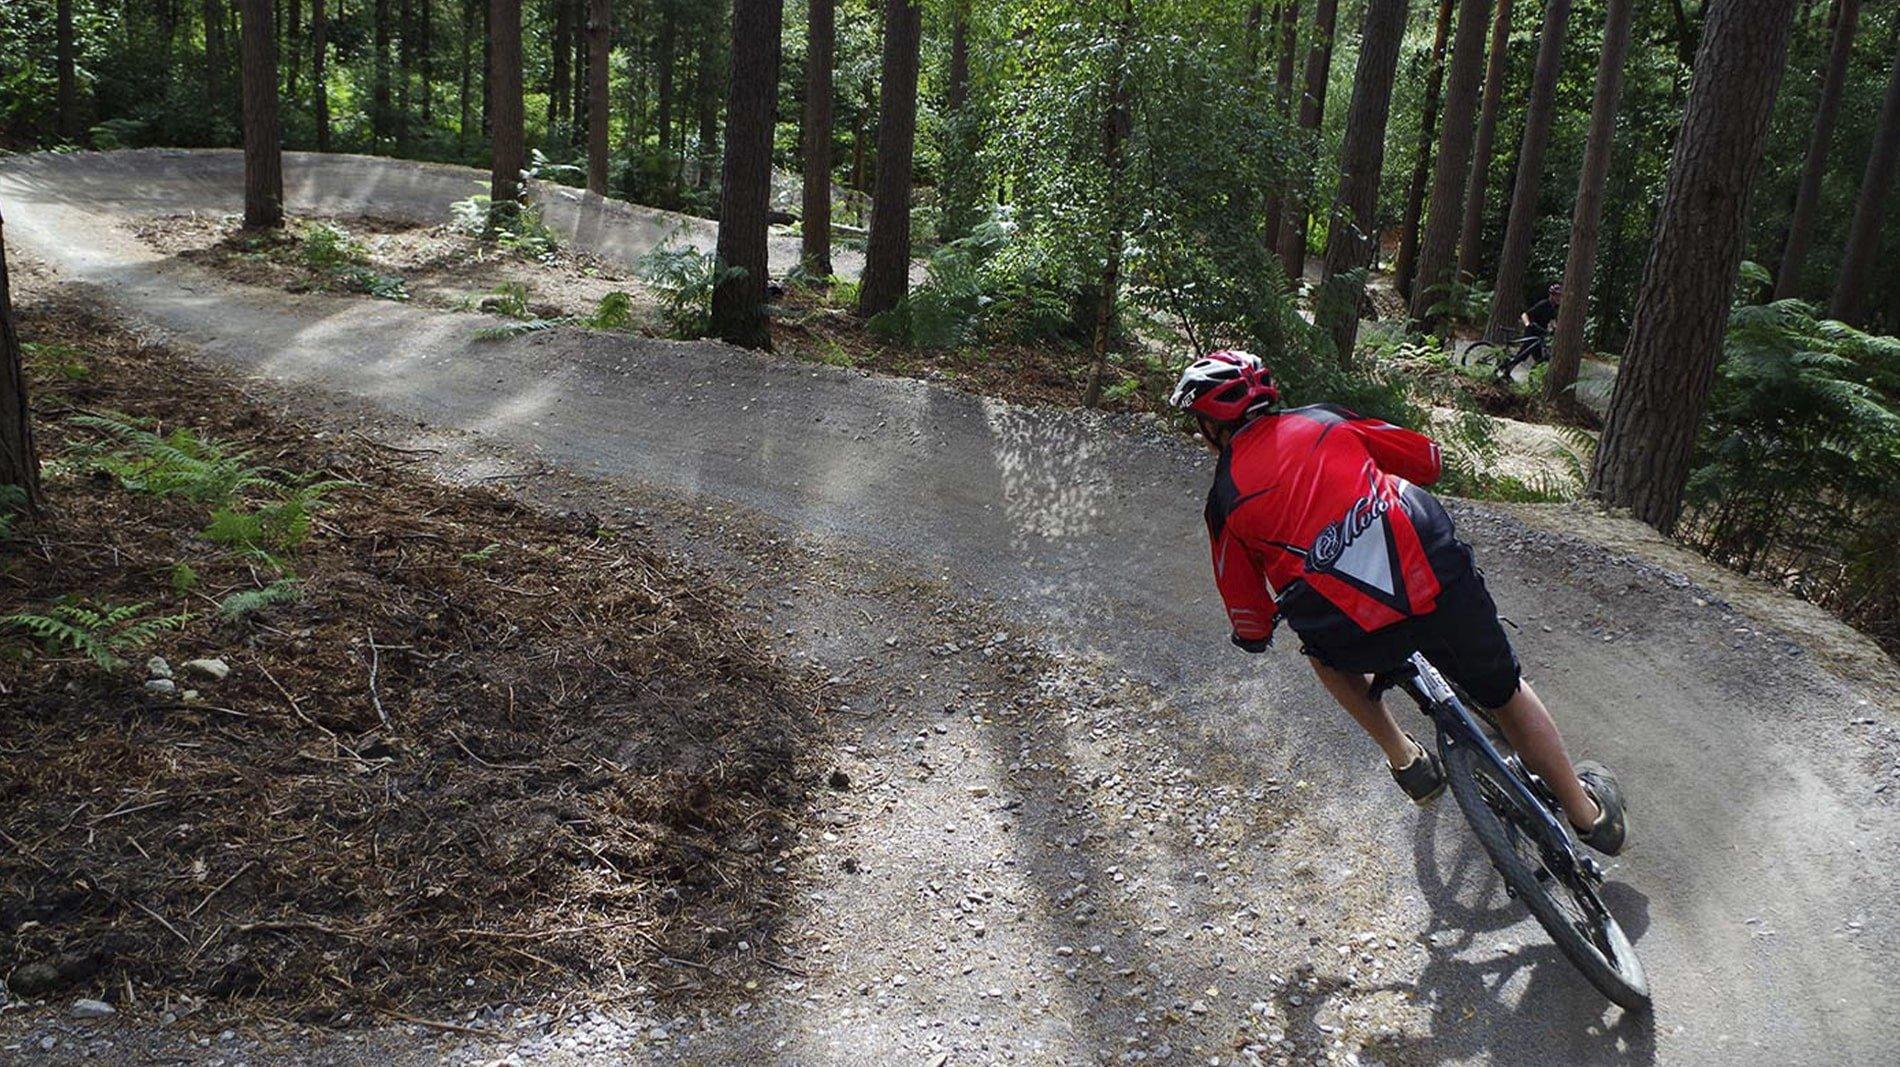 Mountain Biking at New House Farm Country Retreat